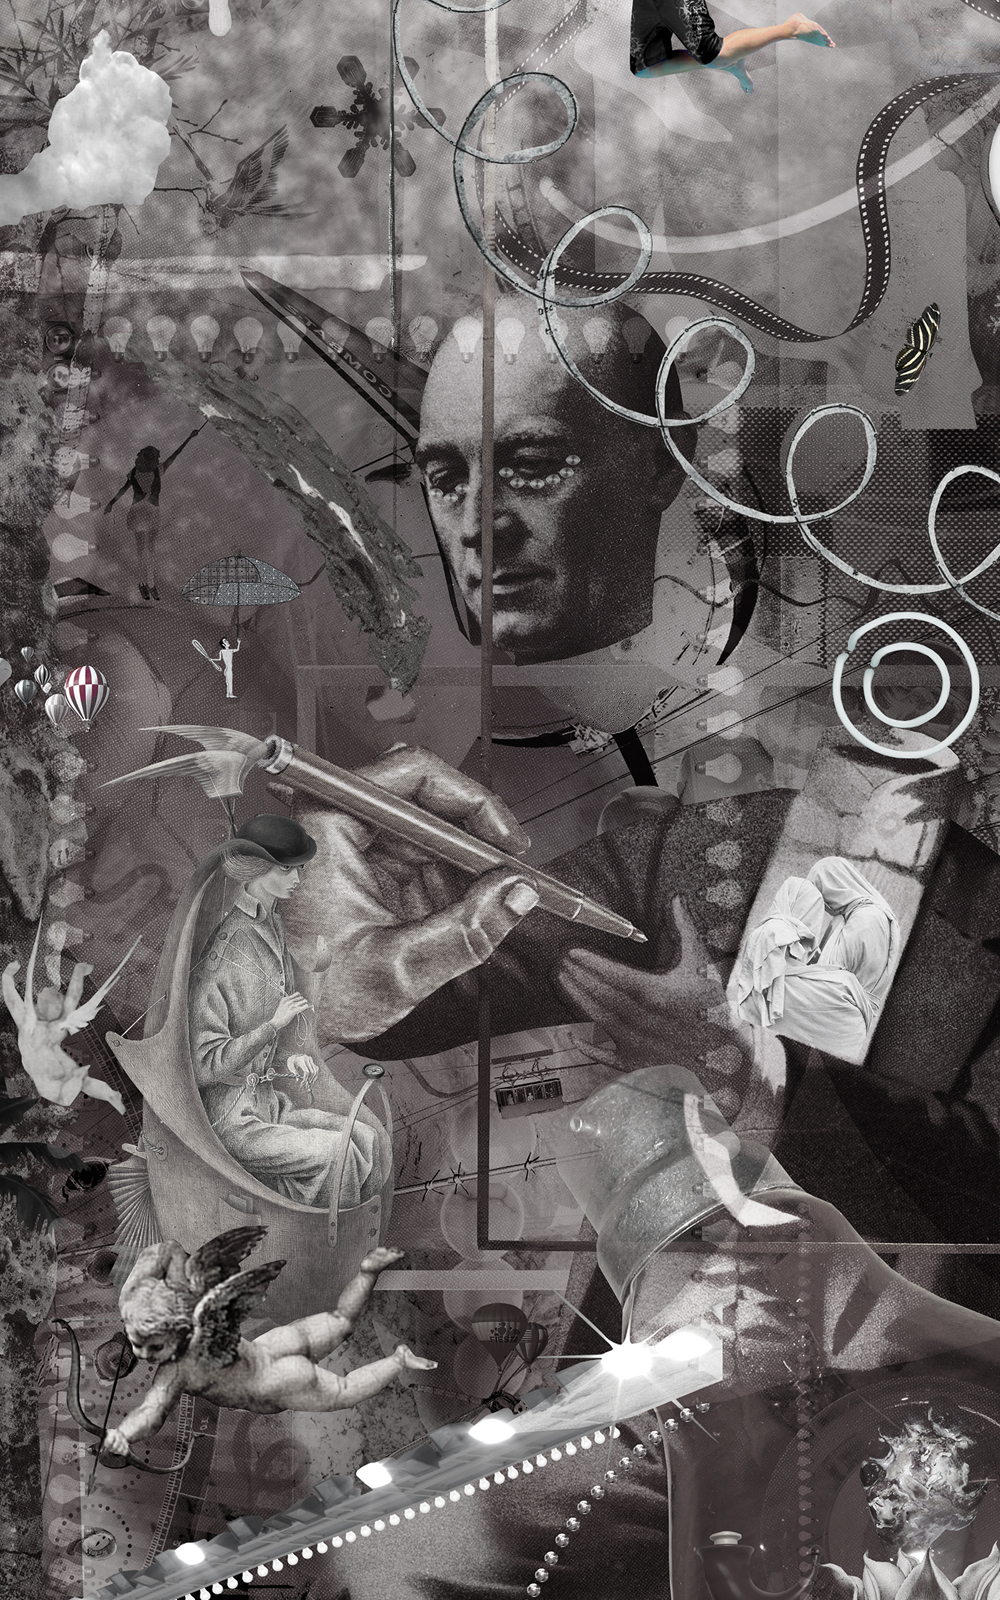 Case Simmons, Simmons & Burke, If Not Summer #2, Kohn Gallery, Hieronymus Bosch, Lightjet Print, Digital Collage,Digital Art, Photoshop Collage, Contemporary Collage,Case Simmons Art, Case Simmons Artist, Collage Fine Art, Hyper Collage, Future Collage, Black and White Collage, Digital Landscape